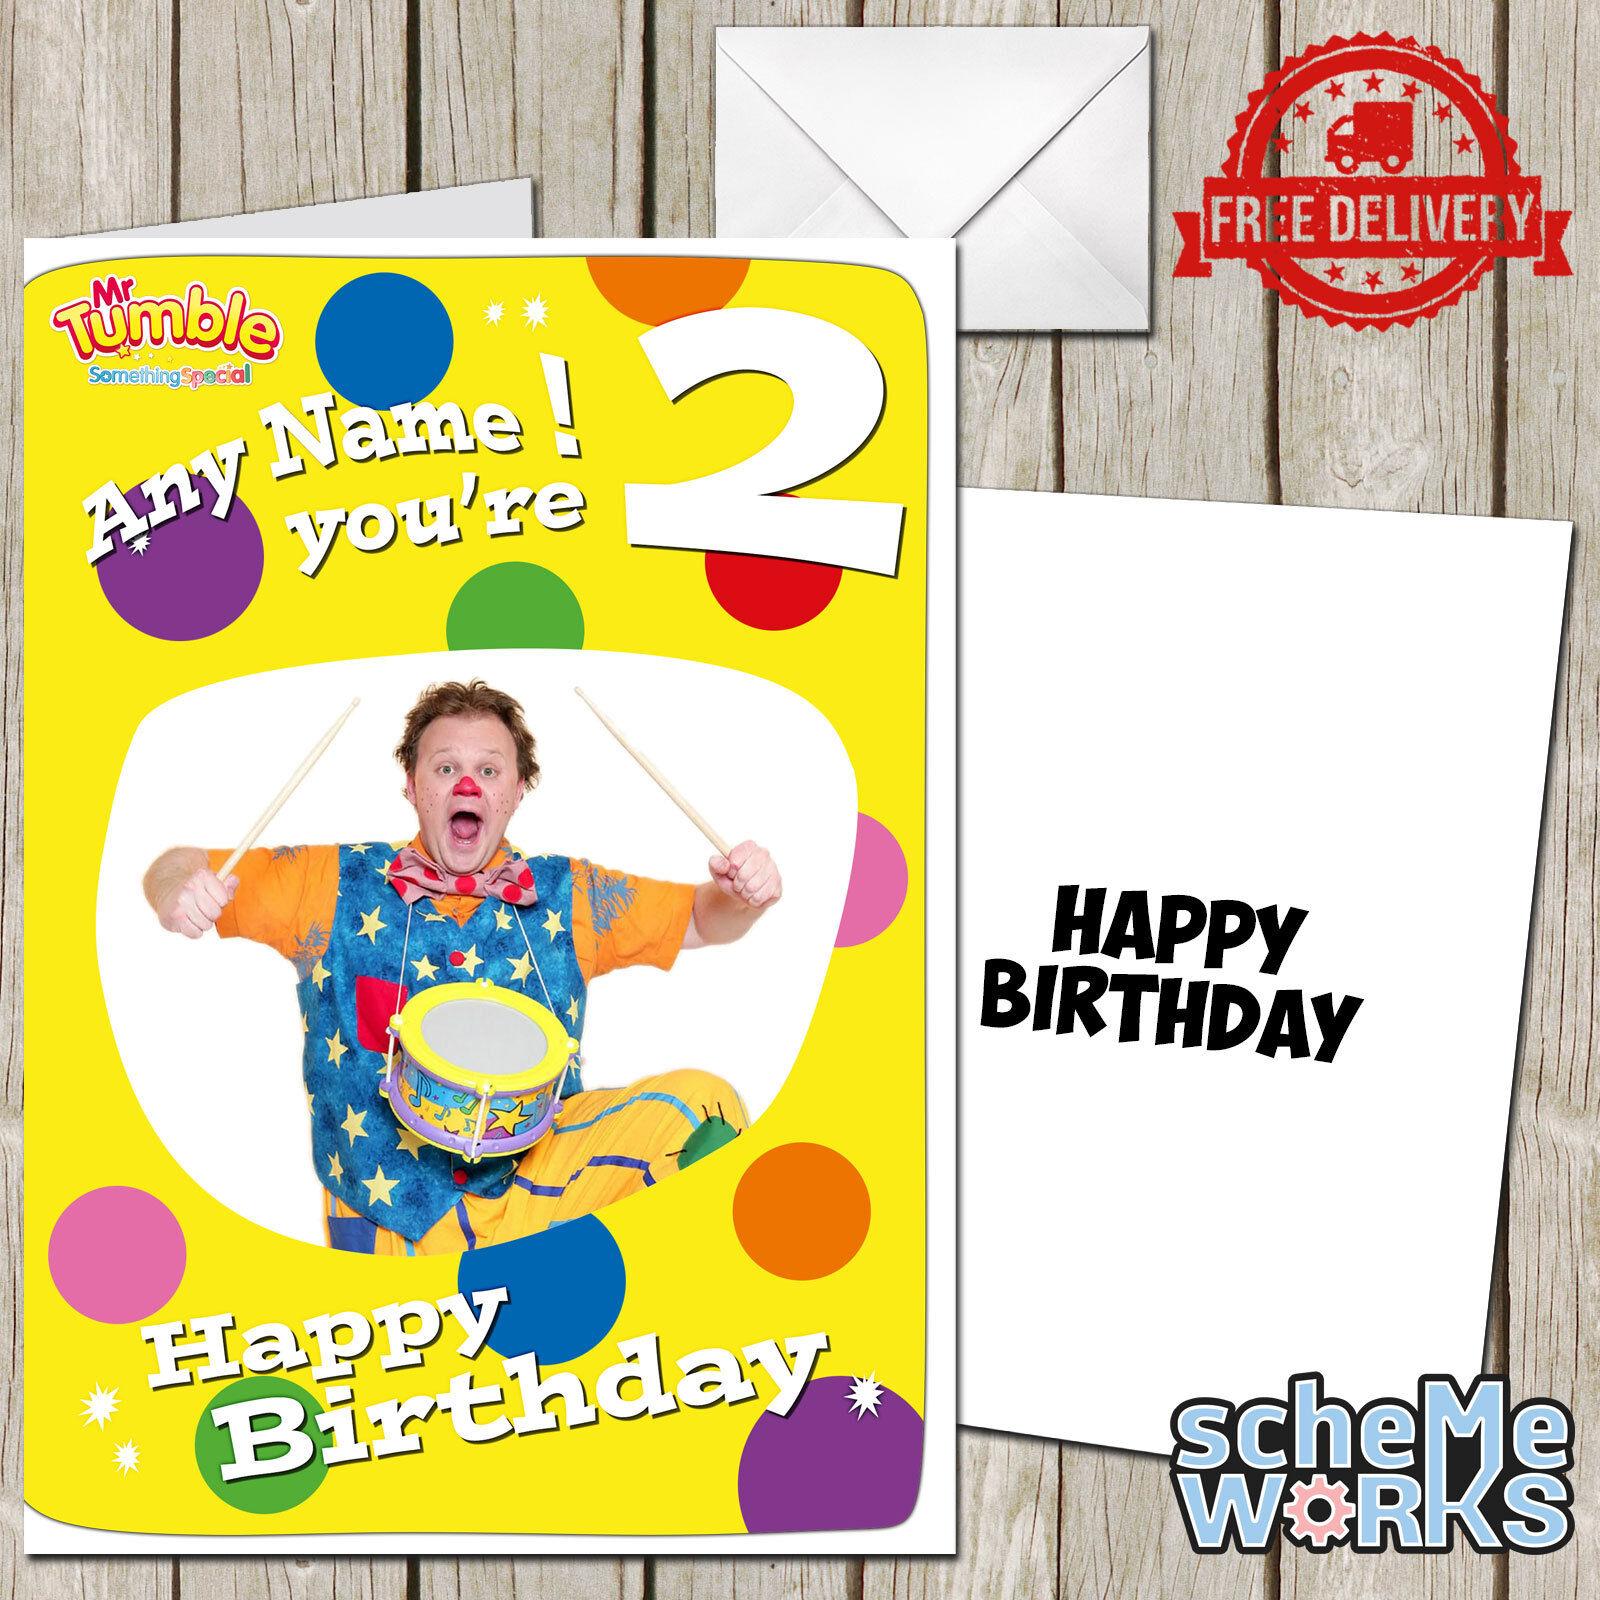 Mr Tumble Personalised Greeting Birthday Card Justin Something – Mr Tumble Birthday Card